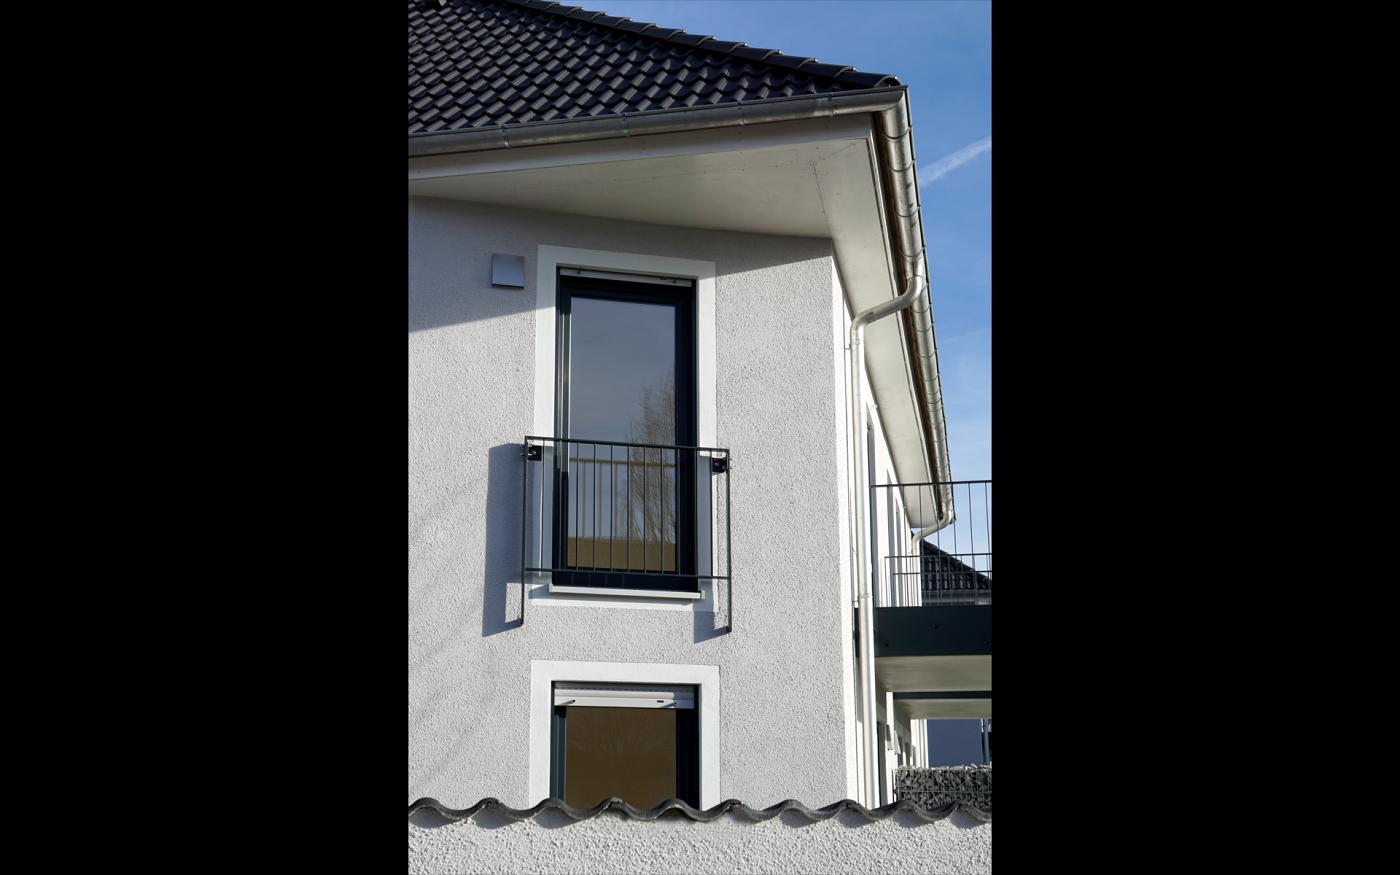 L HOMES Neubau Im Gefilde_Fassadendetail_1912x1200